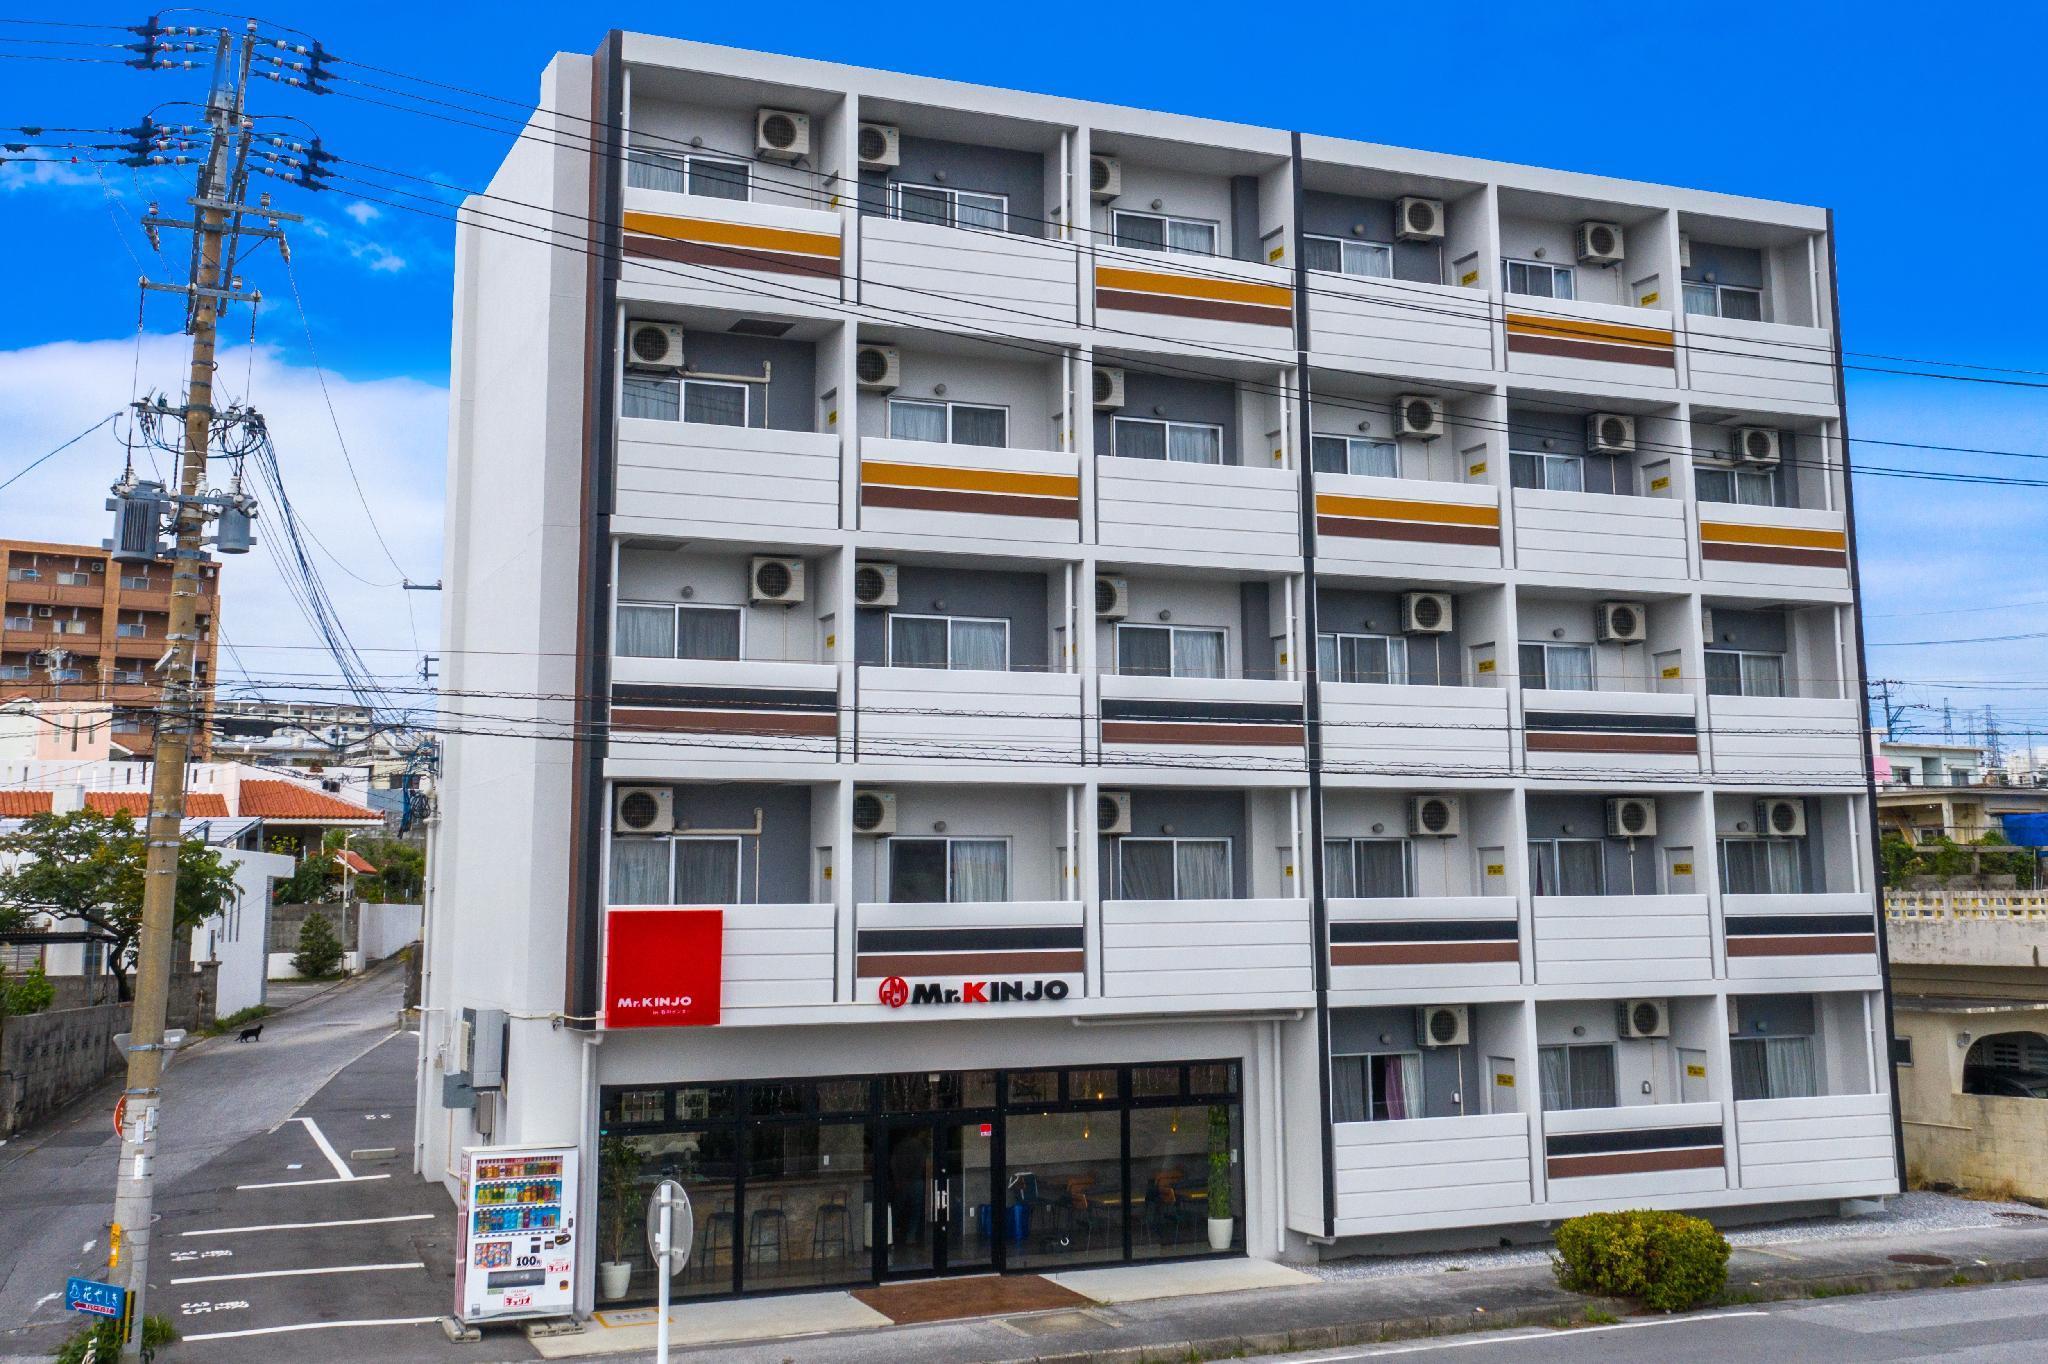 Mr. KINJO in Ishikawainter, Uruma